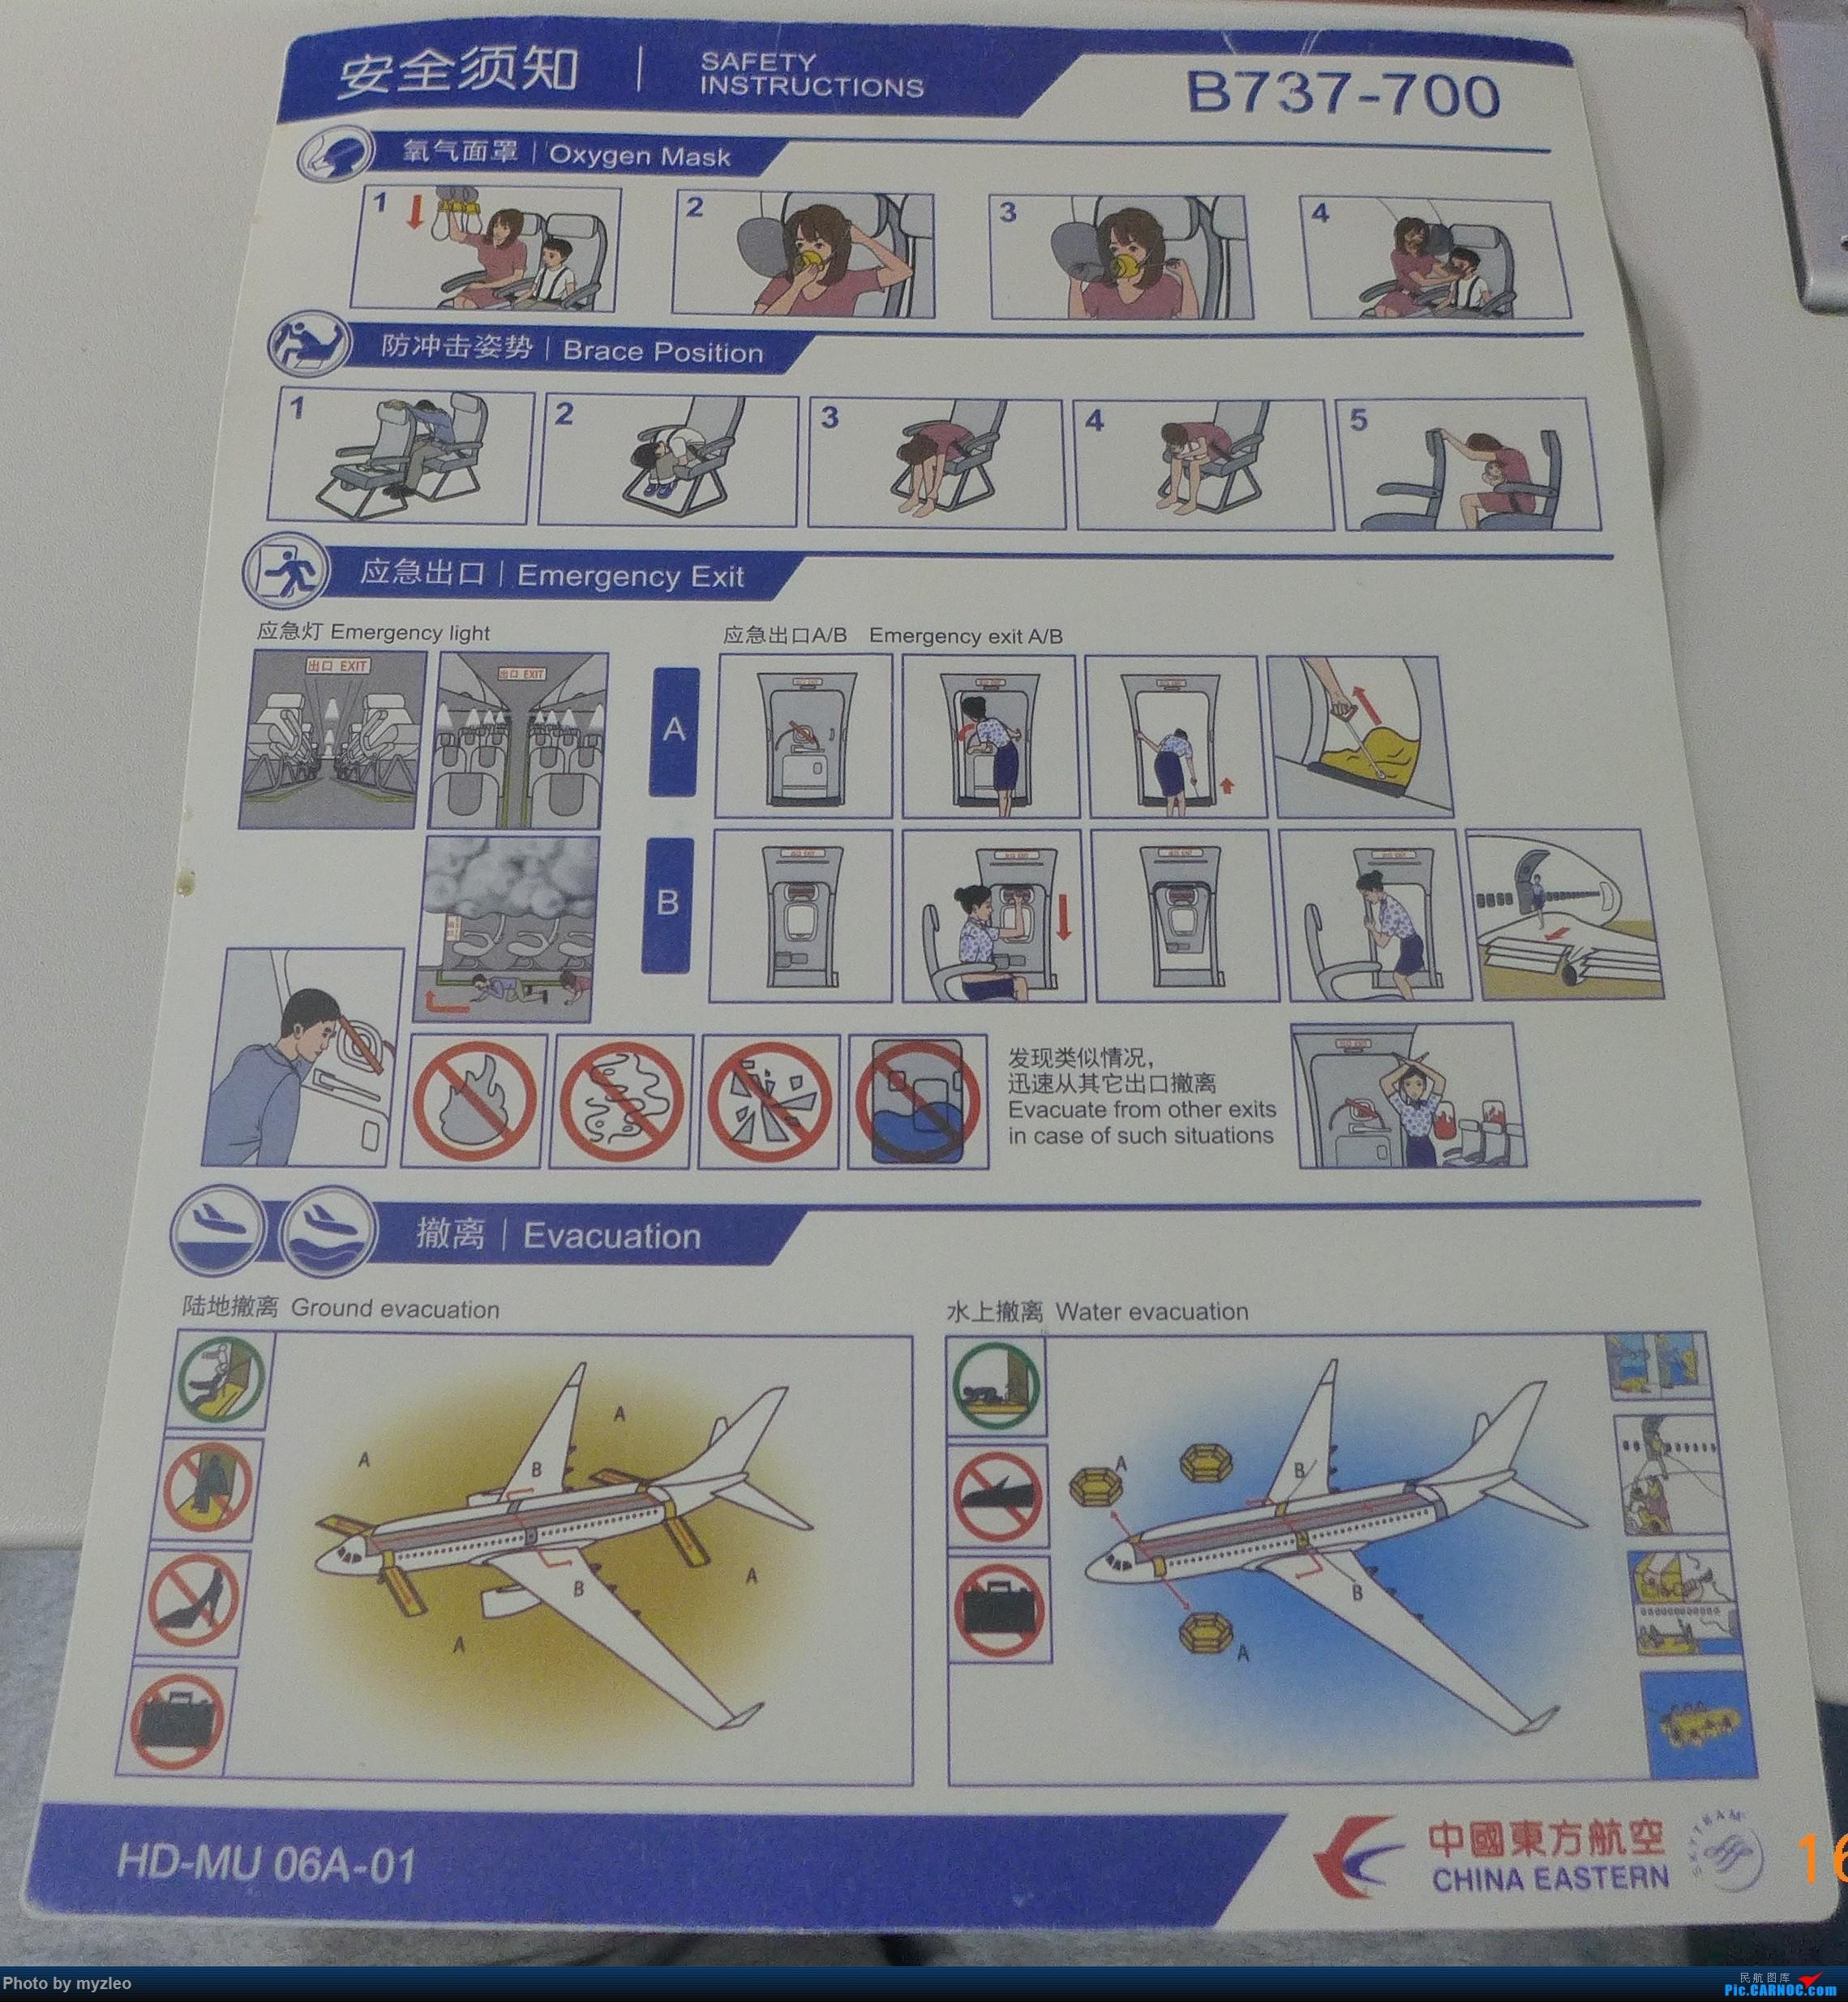 Re:[原创]【myzleo的游记2.2】昆洱风光(2)——去大理+人在大理+不舍返沪 BOEING 737-700 B-5809 中国大理机场